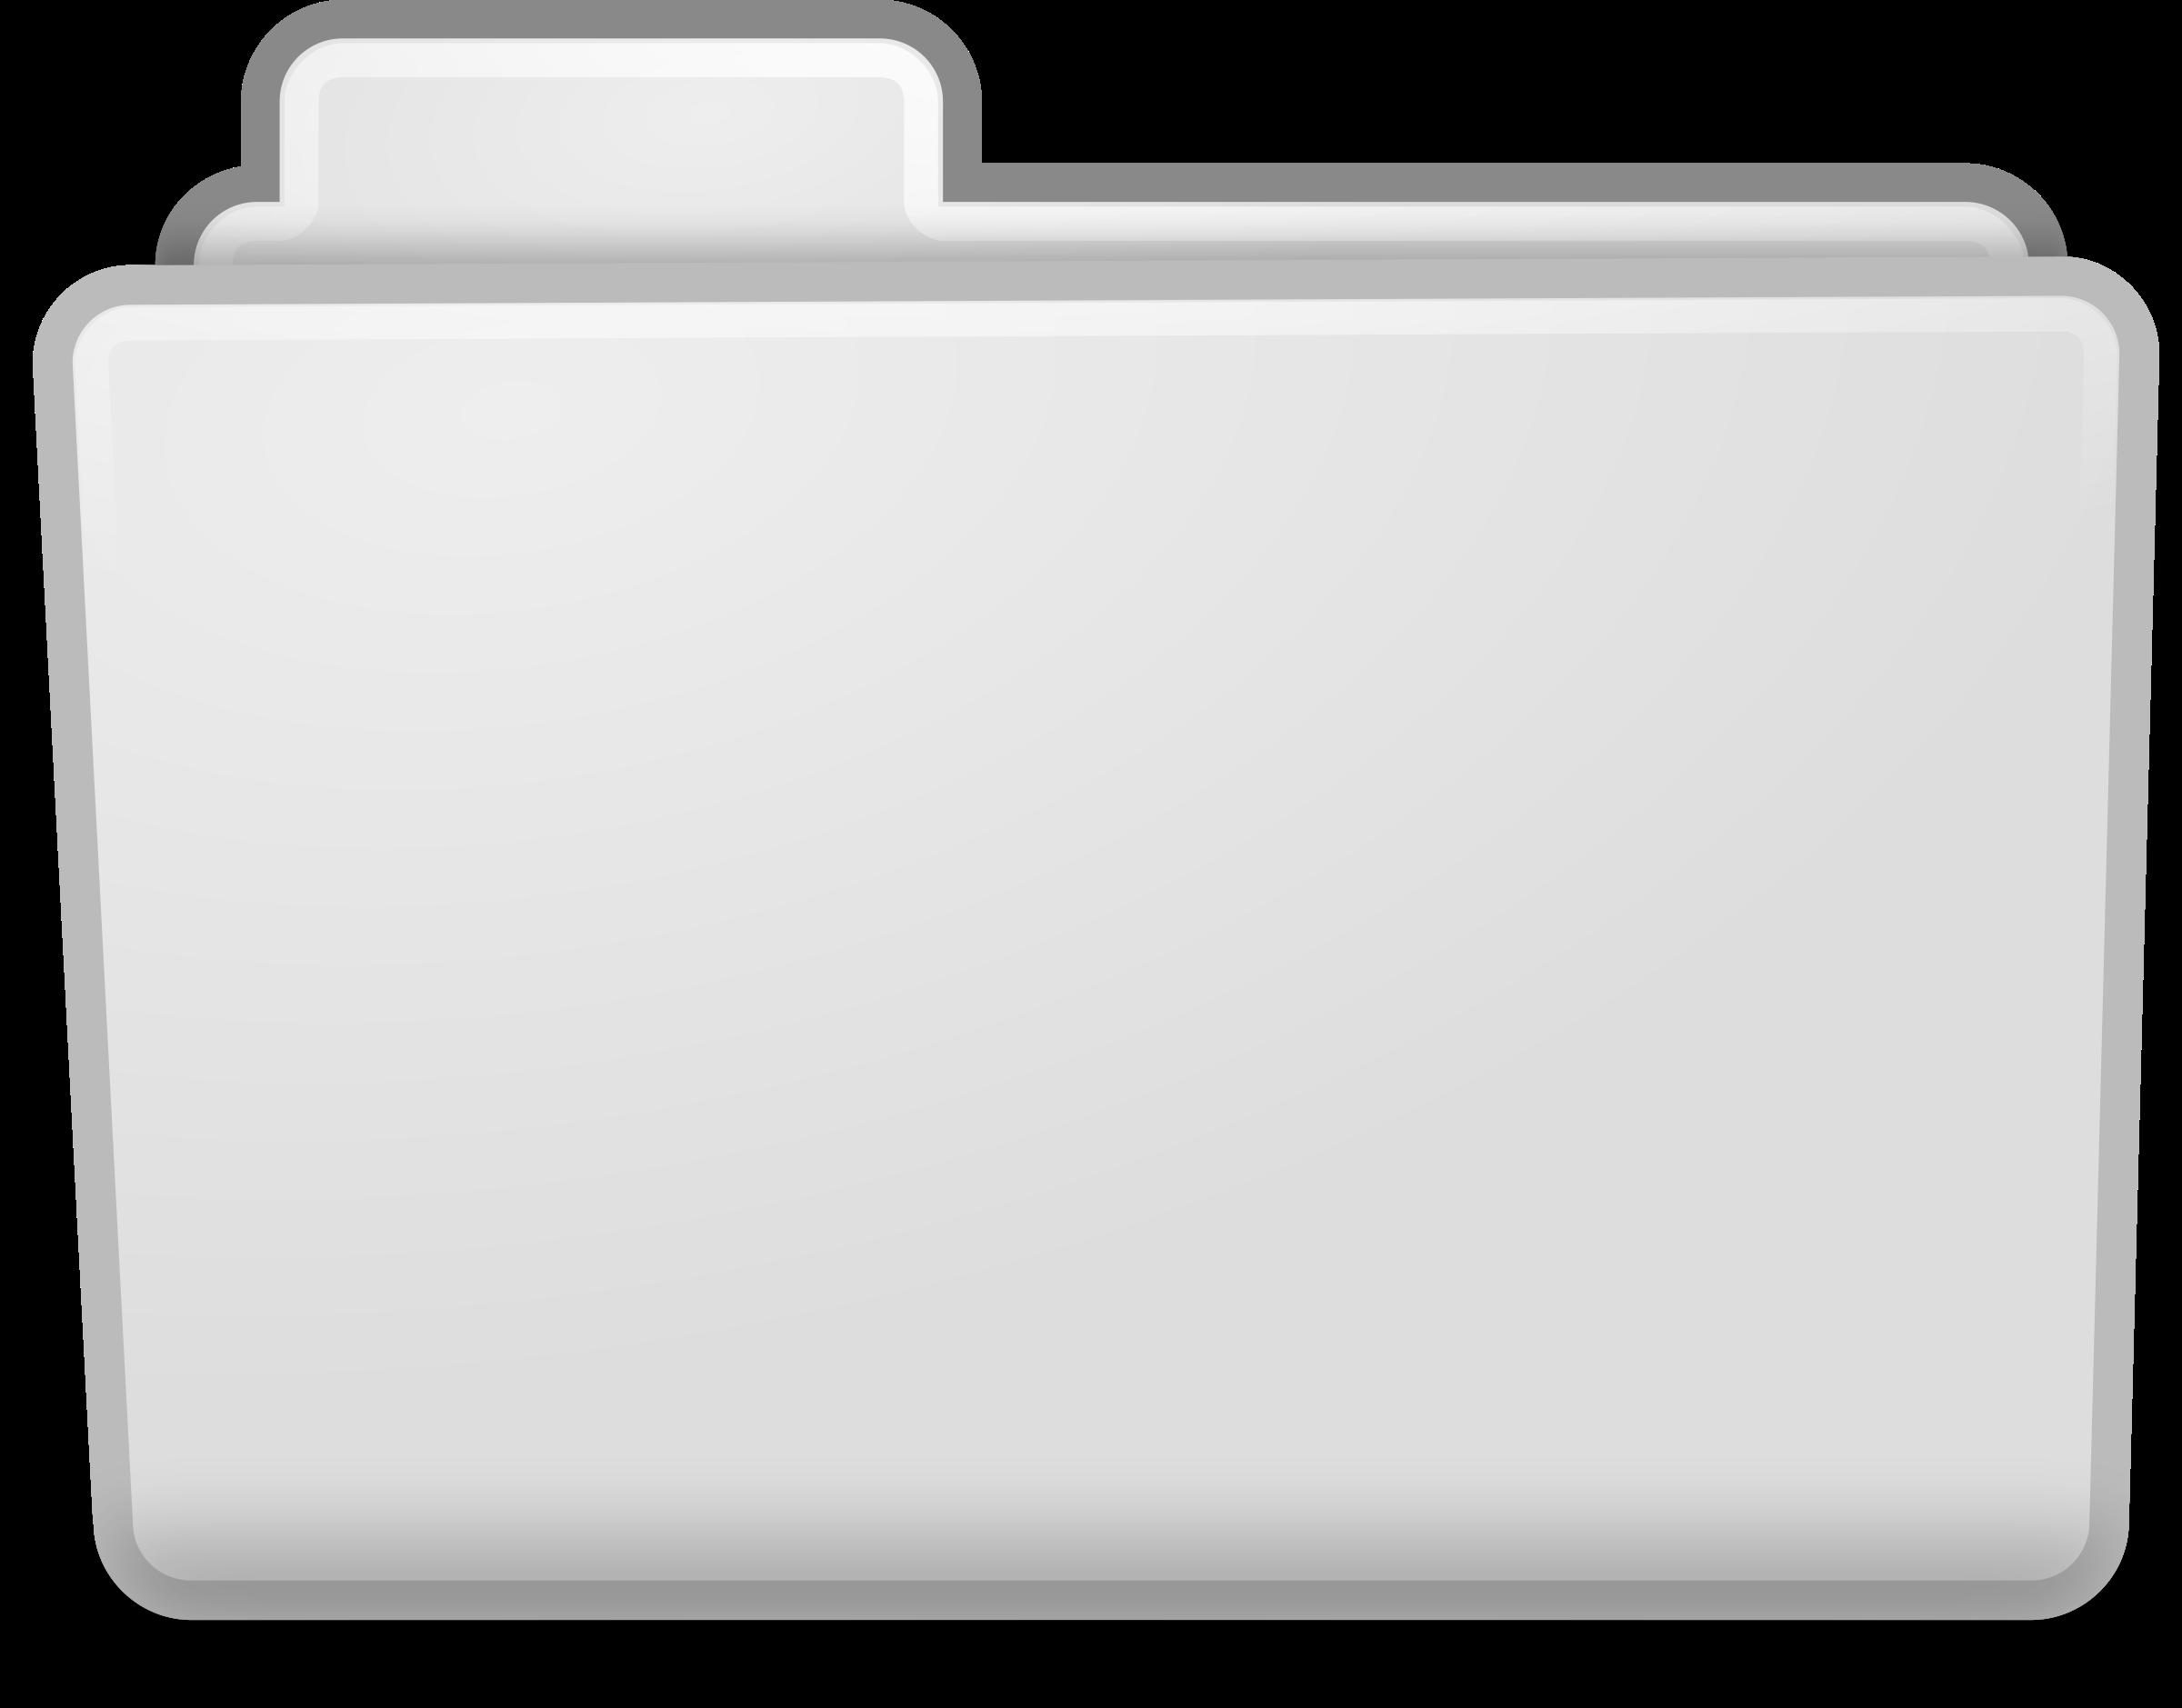 Secret clipart folder. Filing folders excellent clip